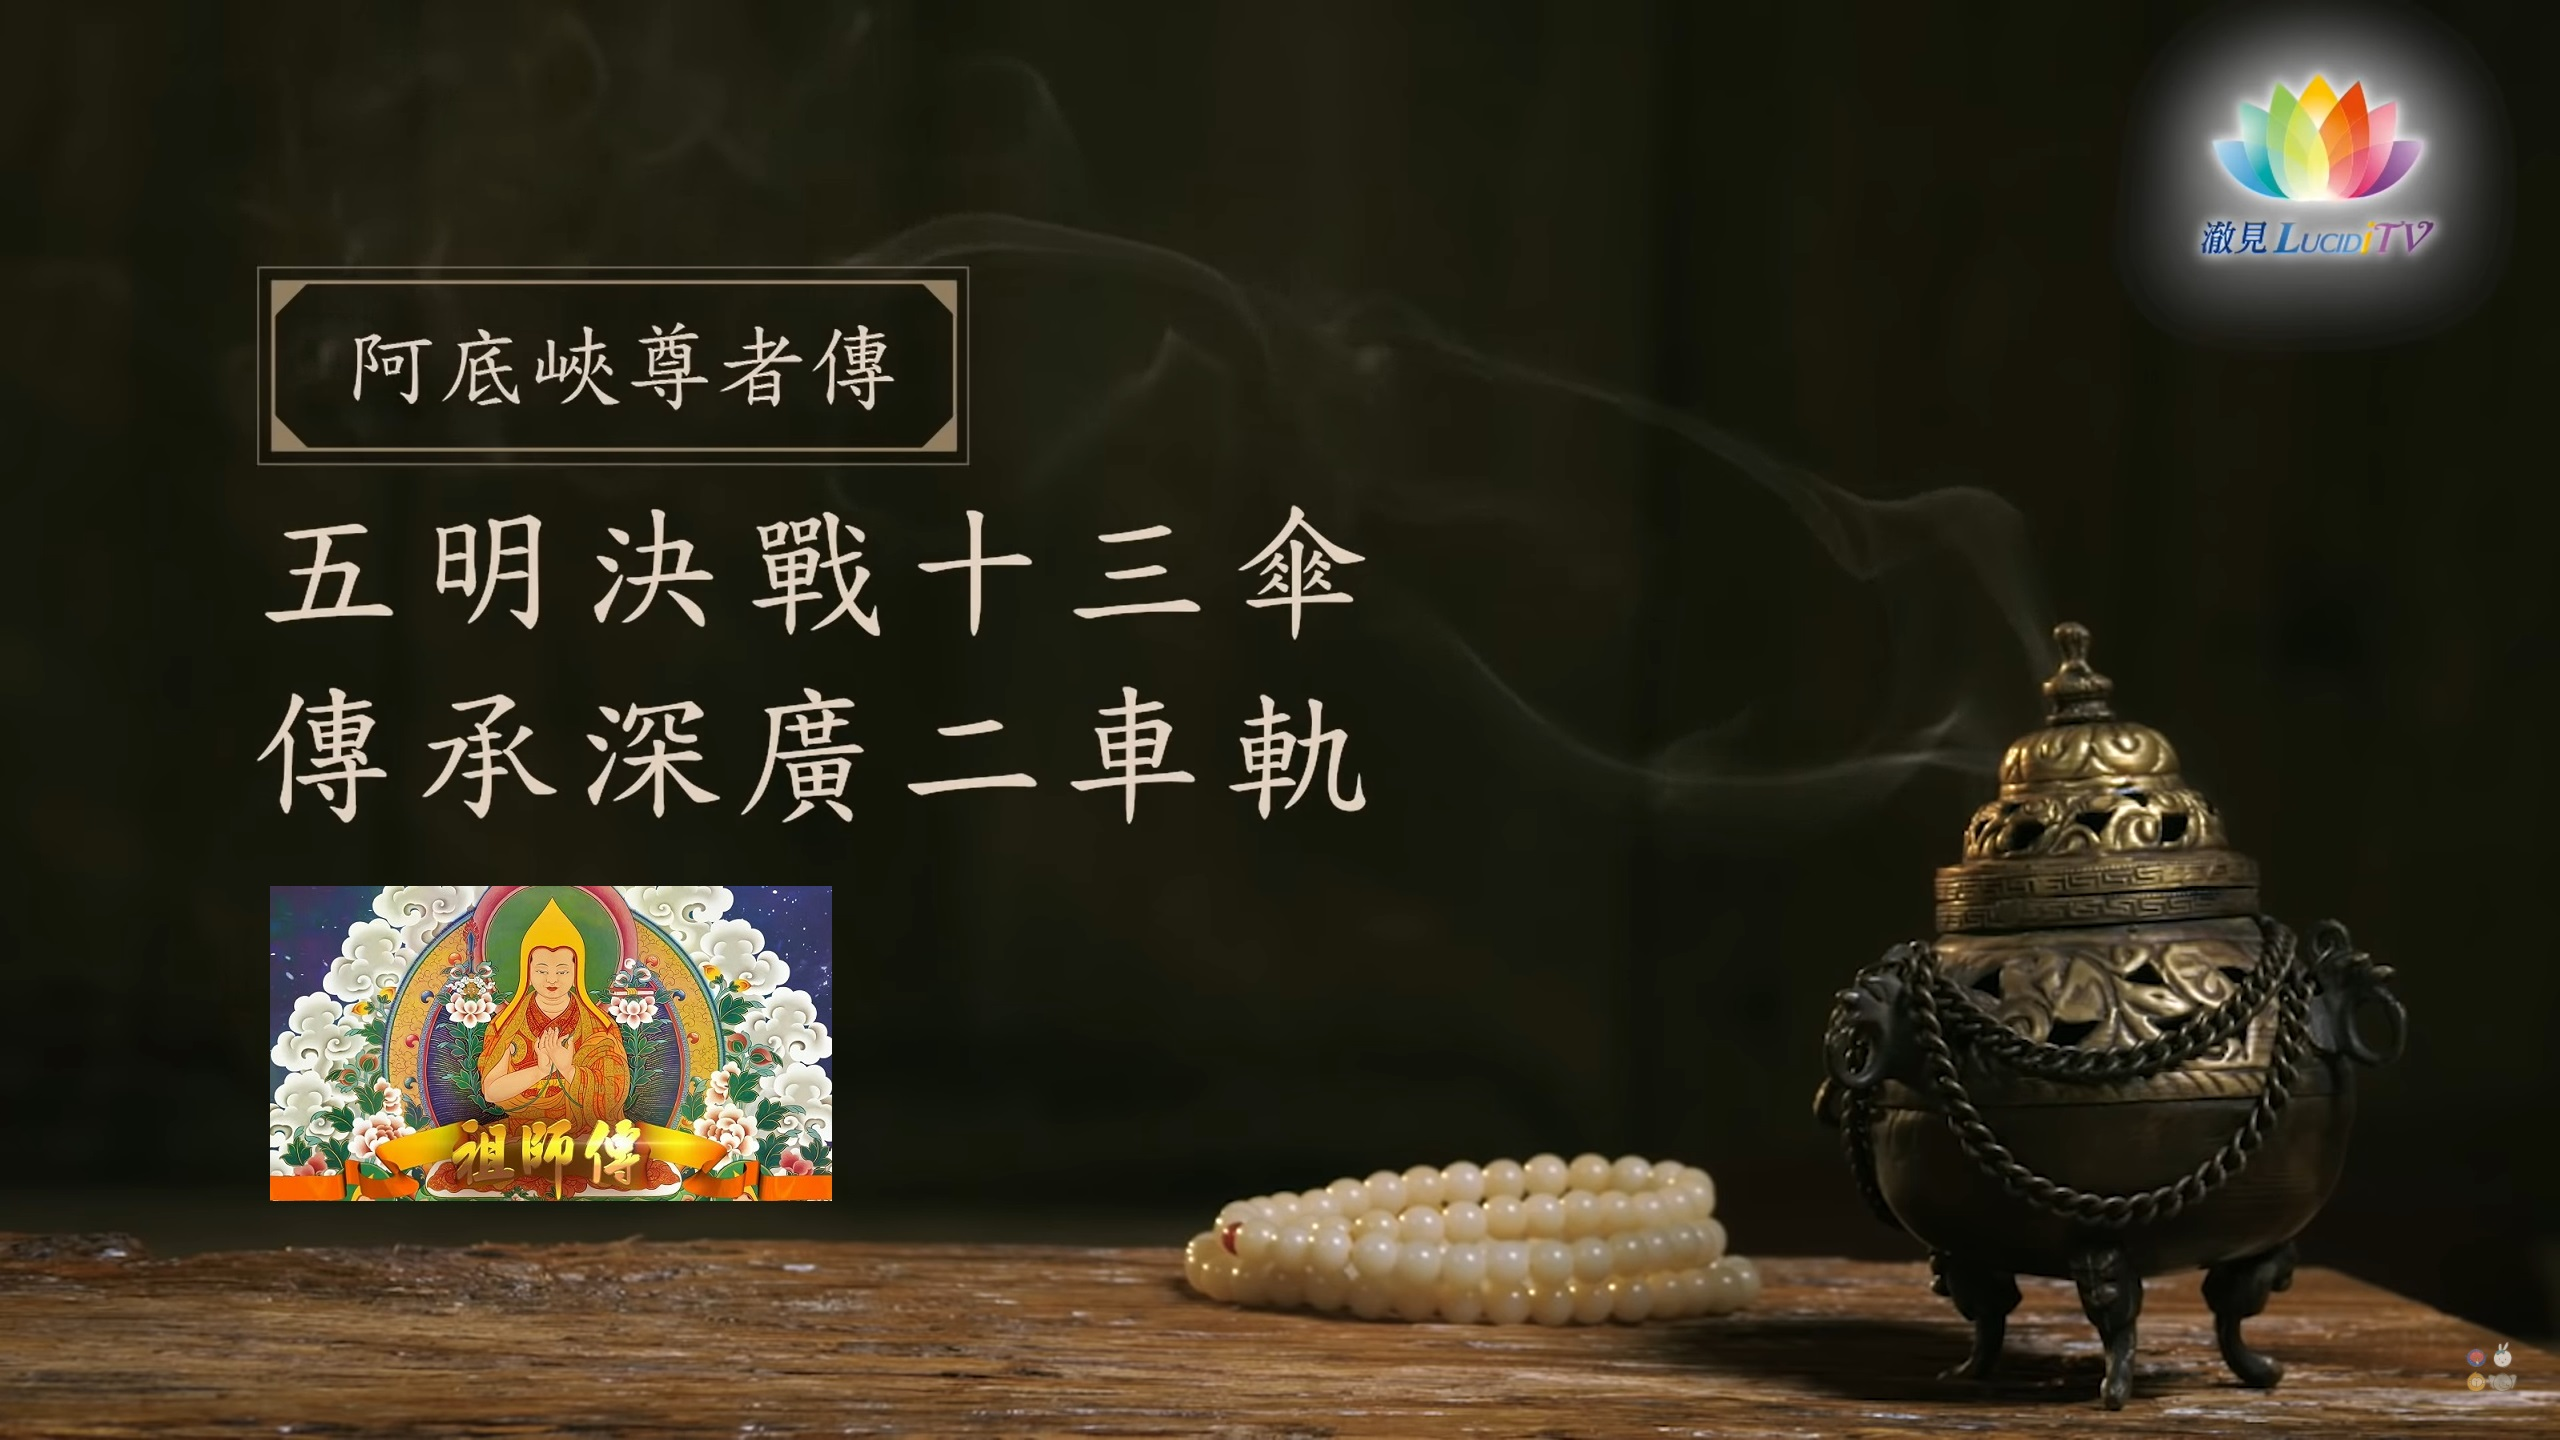 THE LEGACY OF MASTER ATISHA 【 阿底峽尊者傳 】#12   五明大戰十三傘・傳承深廣二車軌 祖師傳 21.9.2020